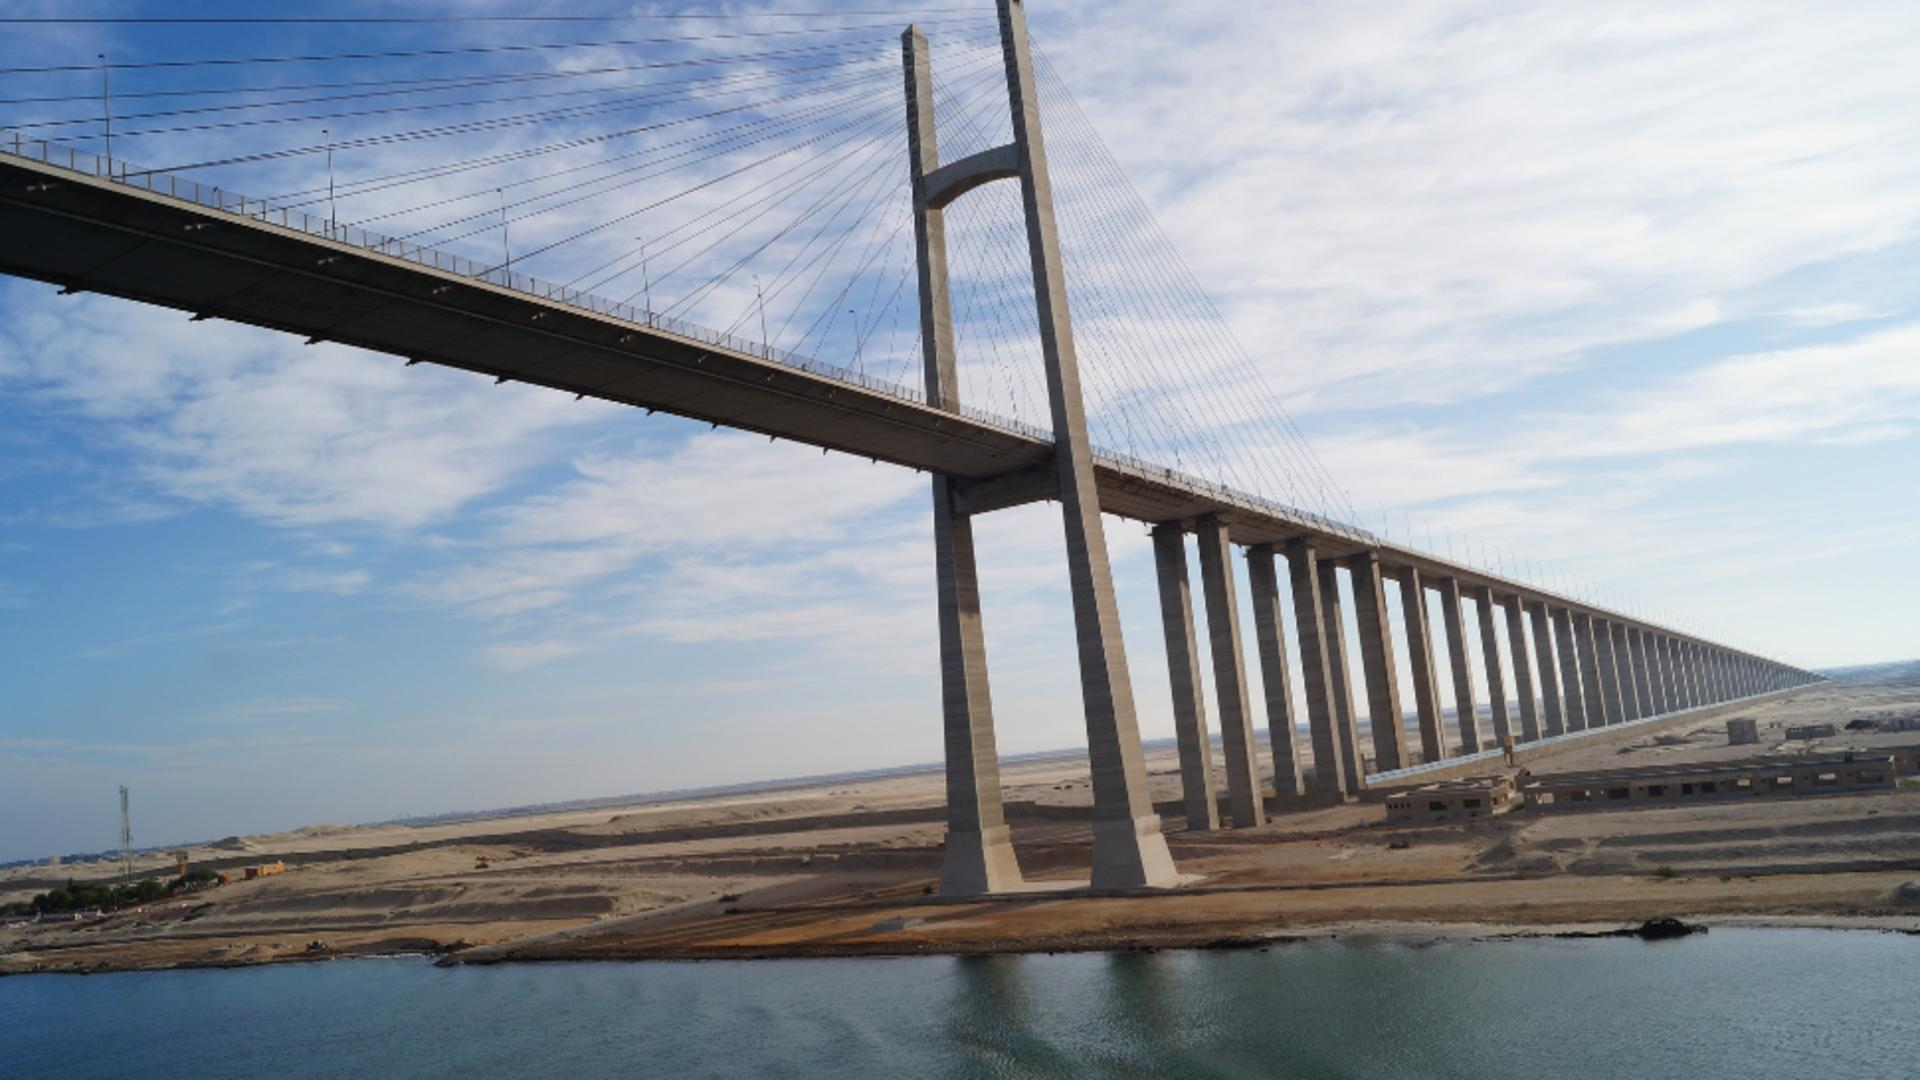 Canalul Suez/sursa foto: Pixabay